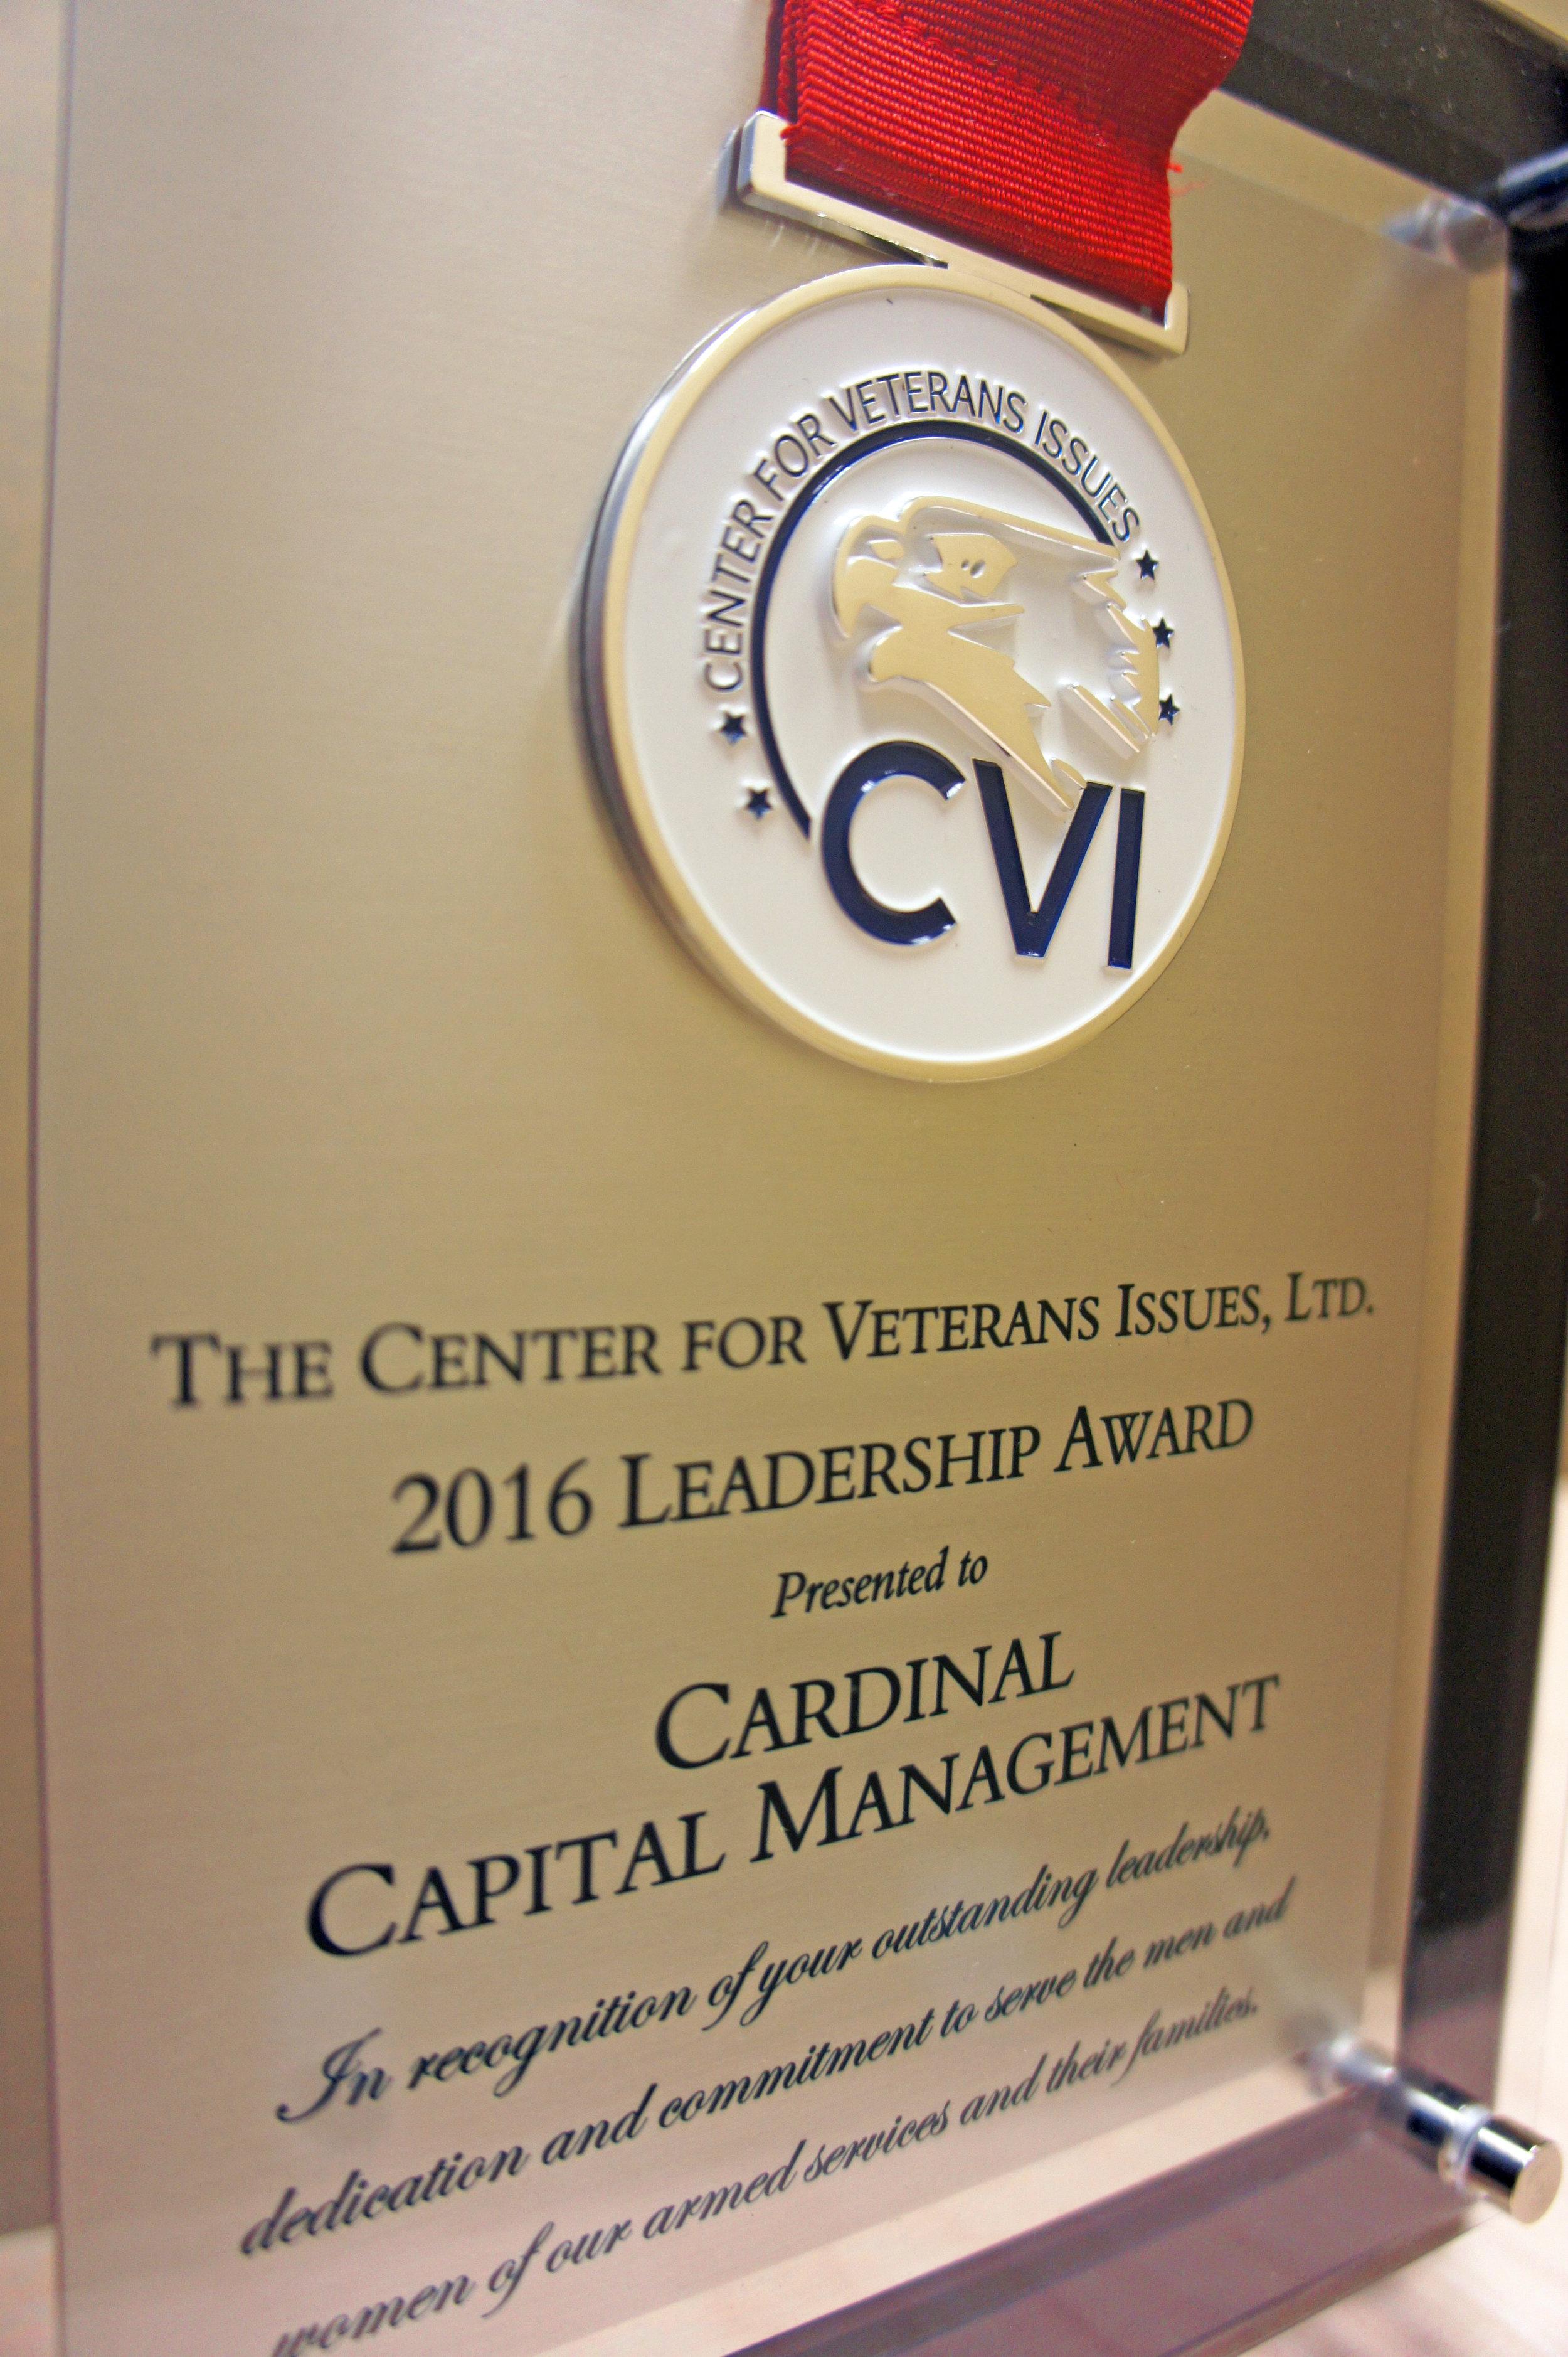 2016 Leadership Award